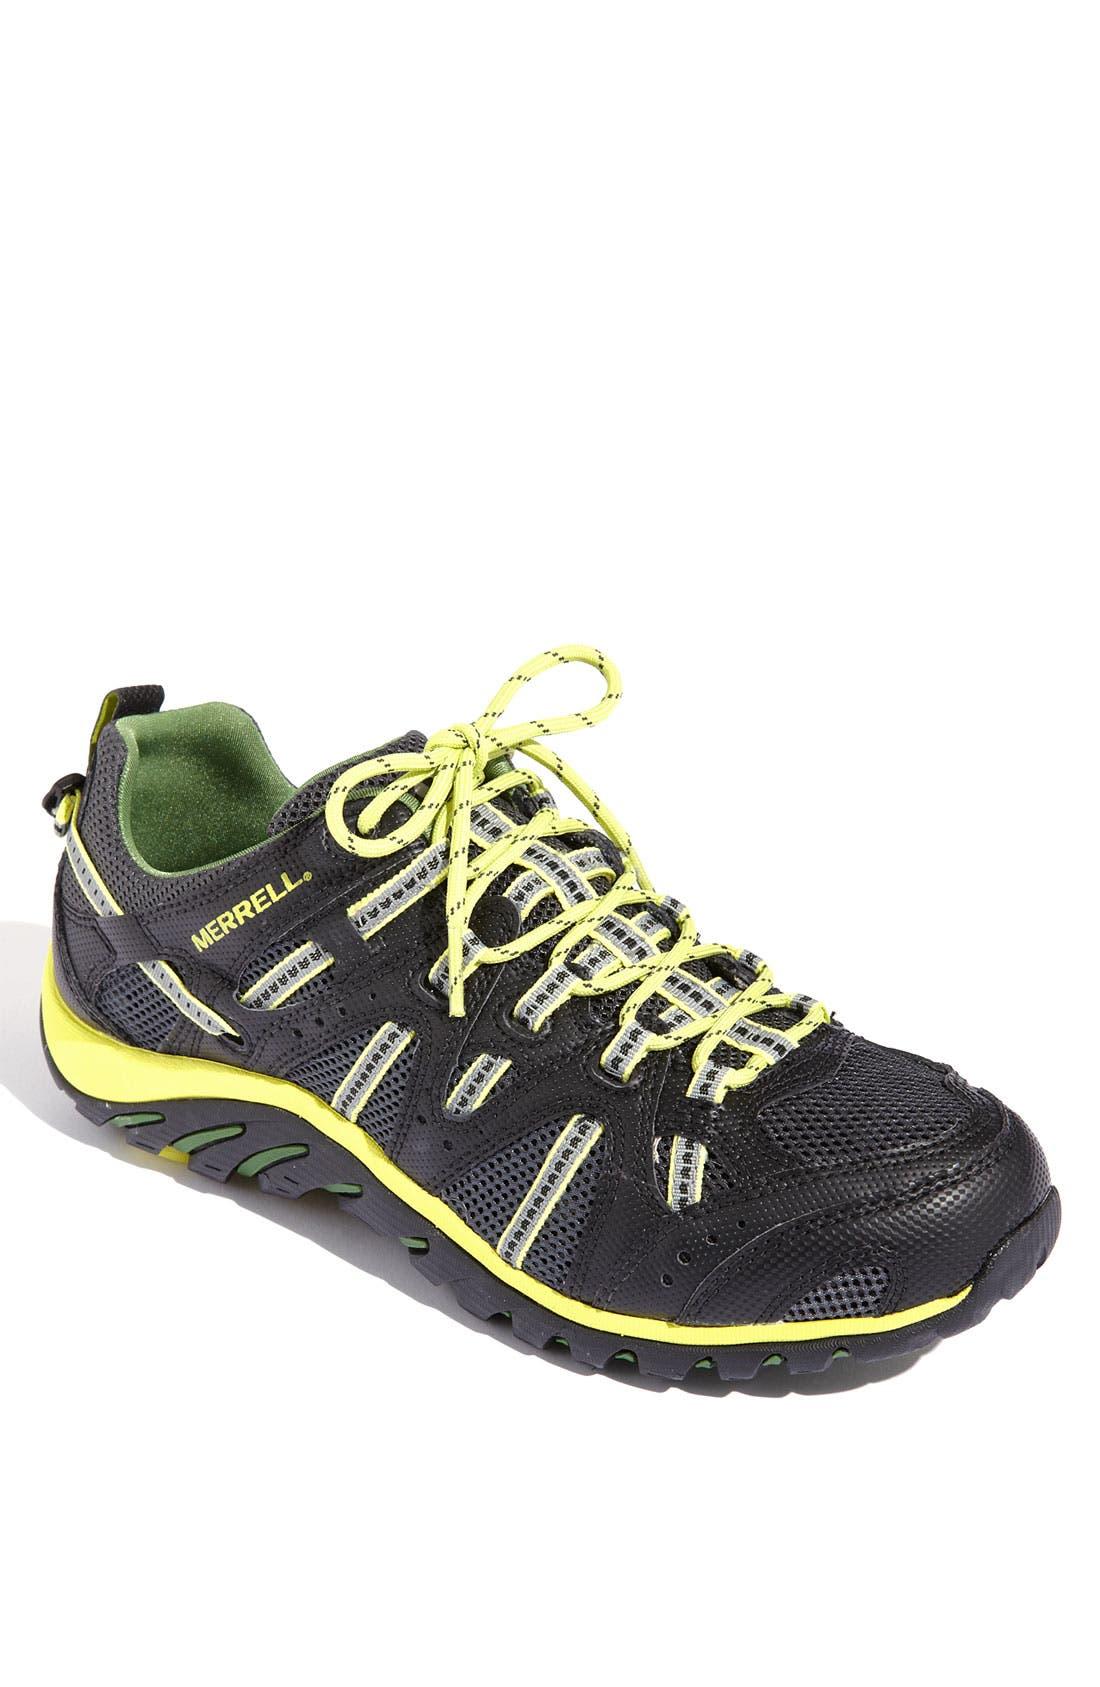 Alternate Image 1 Selected - Merrell 'Waterpro Manistee' Trail Shoe (Men)